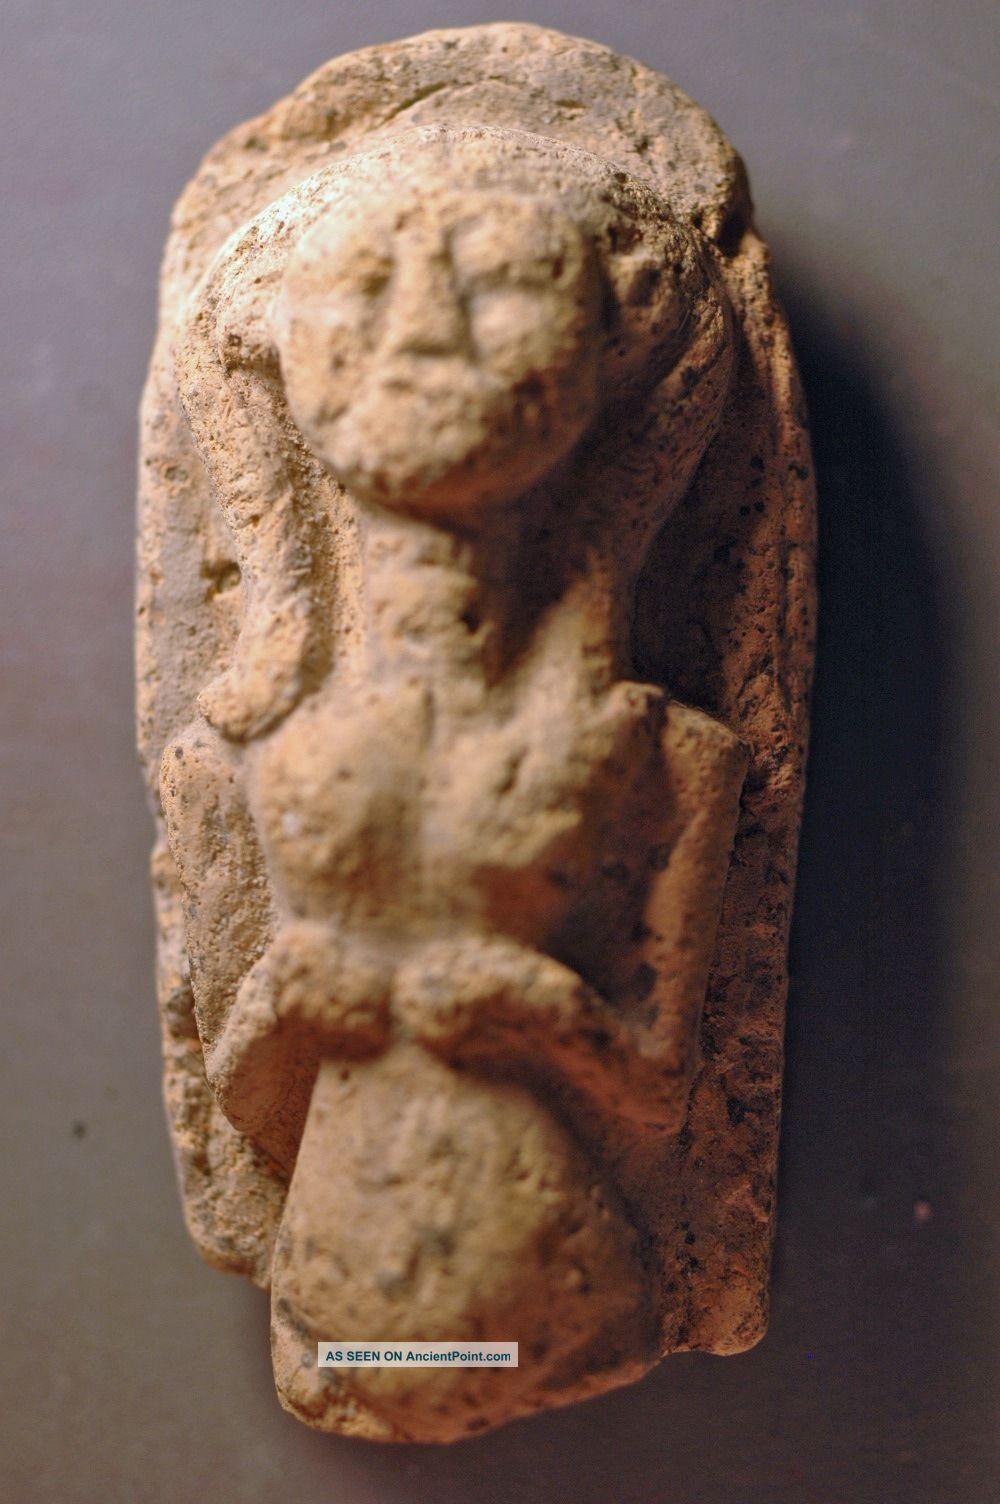 Idol,  Levantine Bronze Age Clay Over 3000 Years Old Near Eastern photo